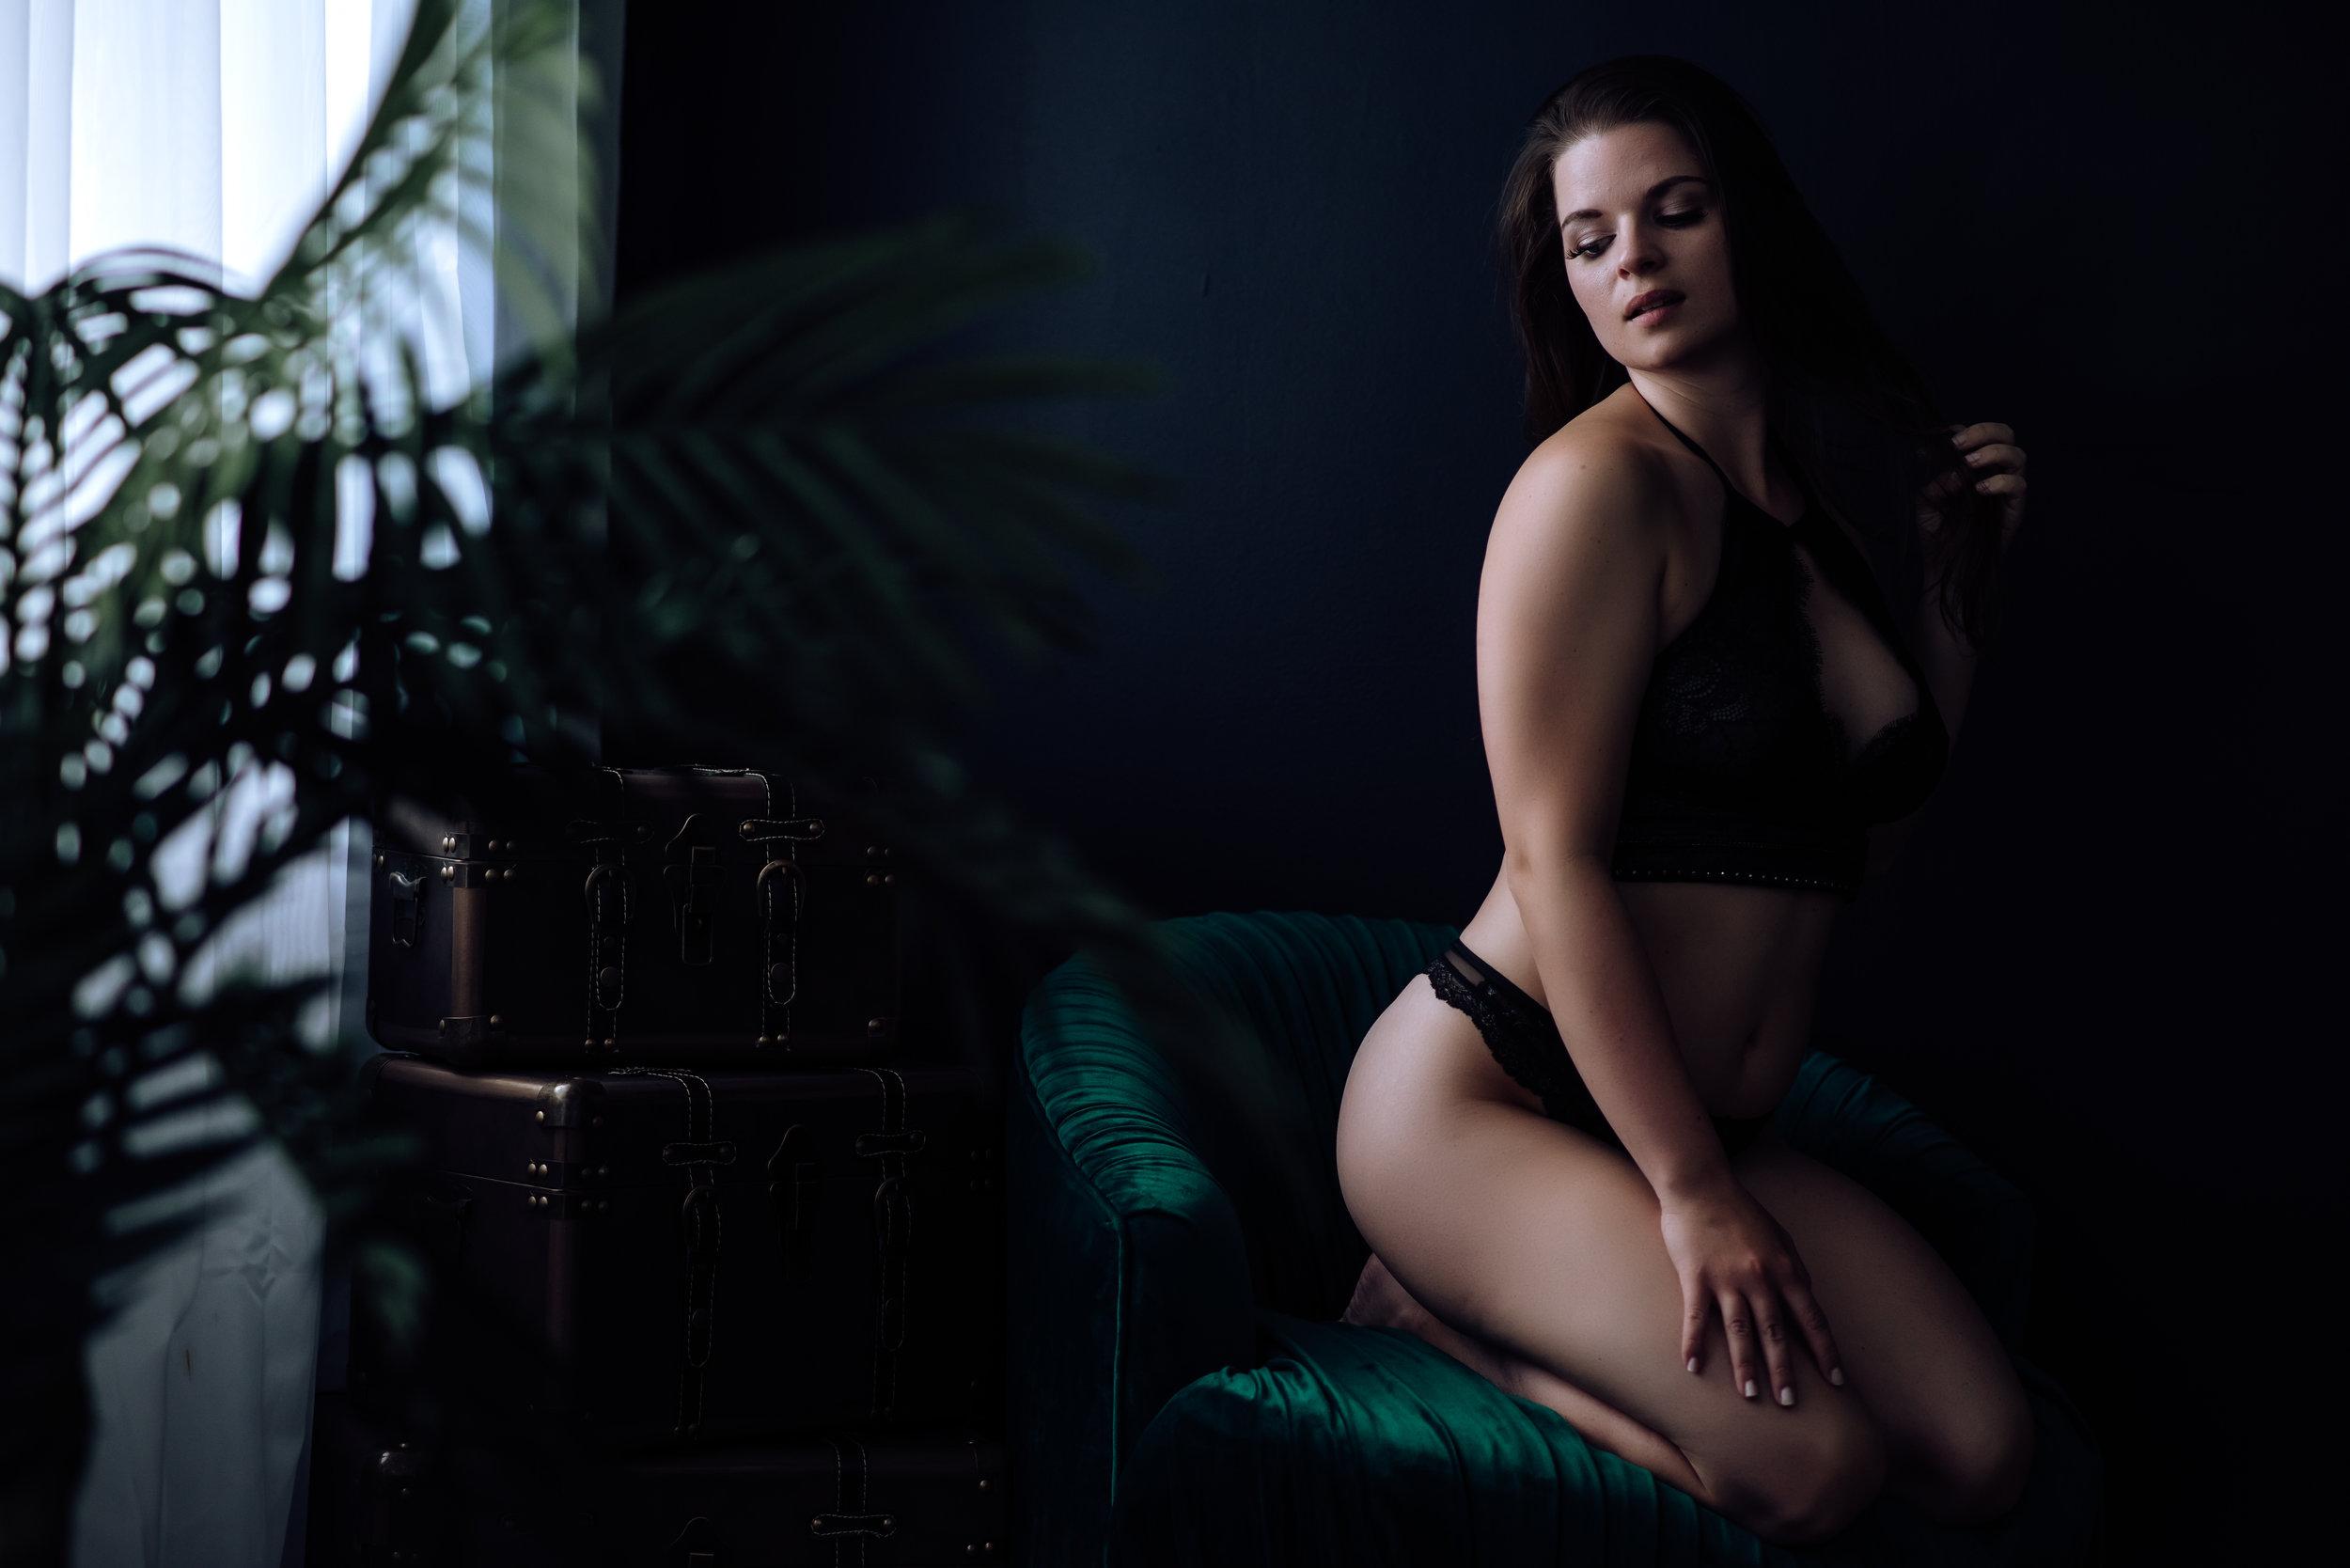 boudoir-photography-best-in-berks-12.jpg